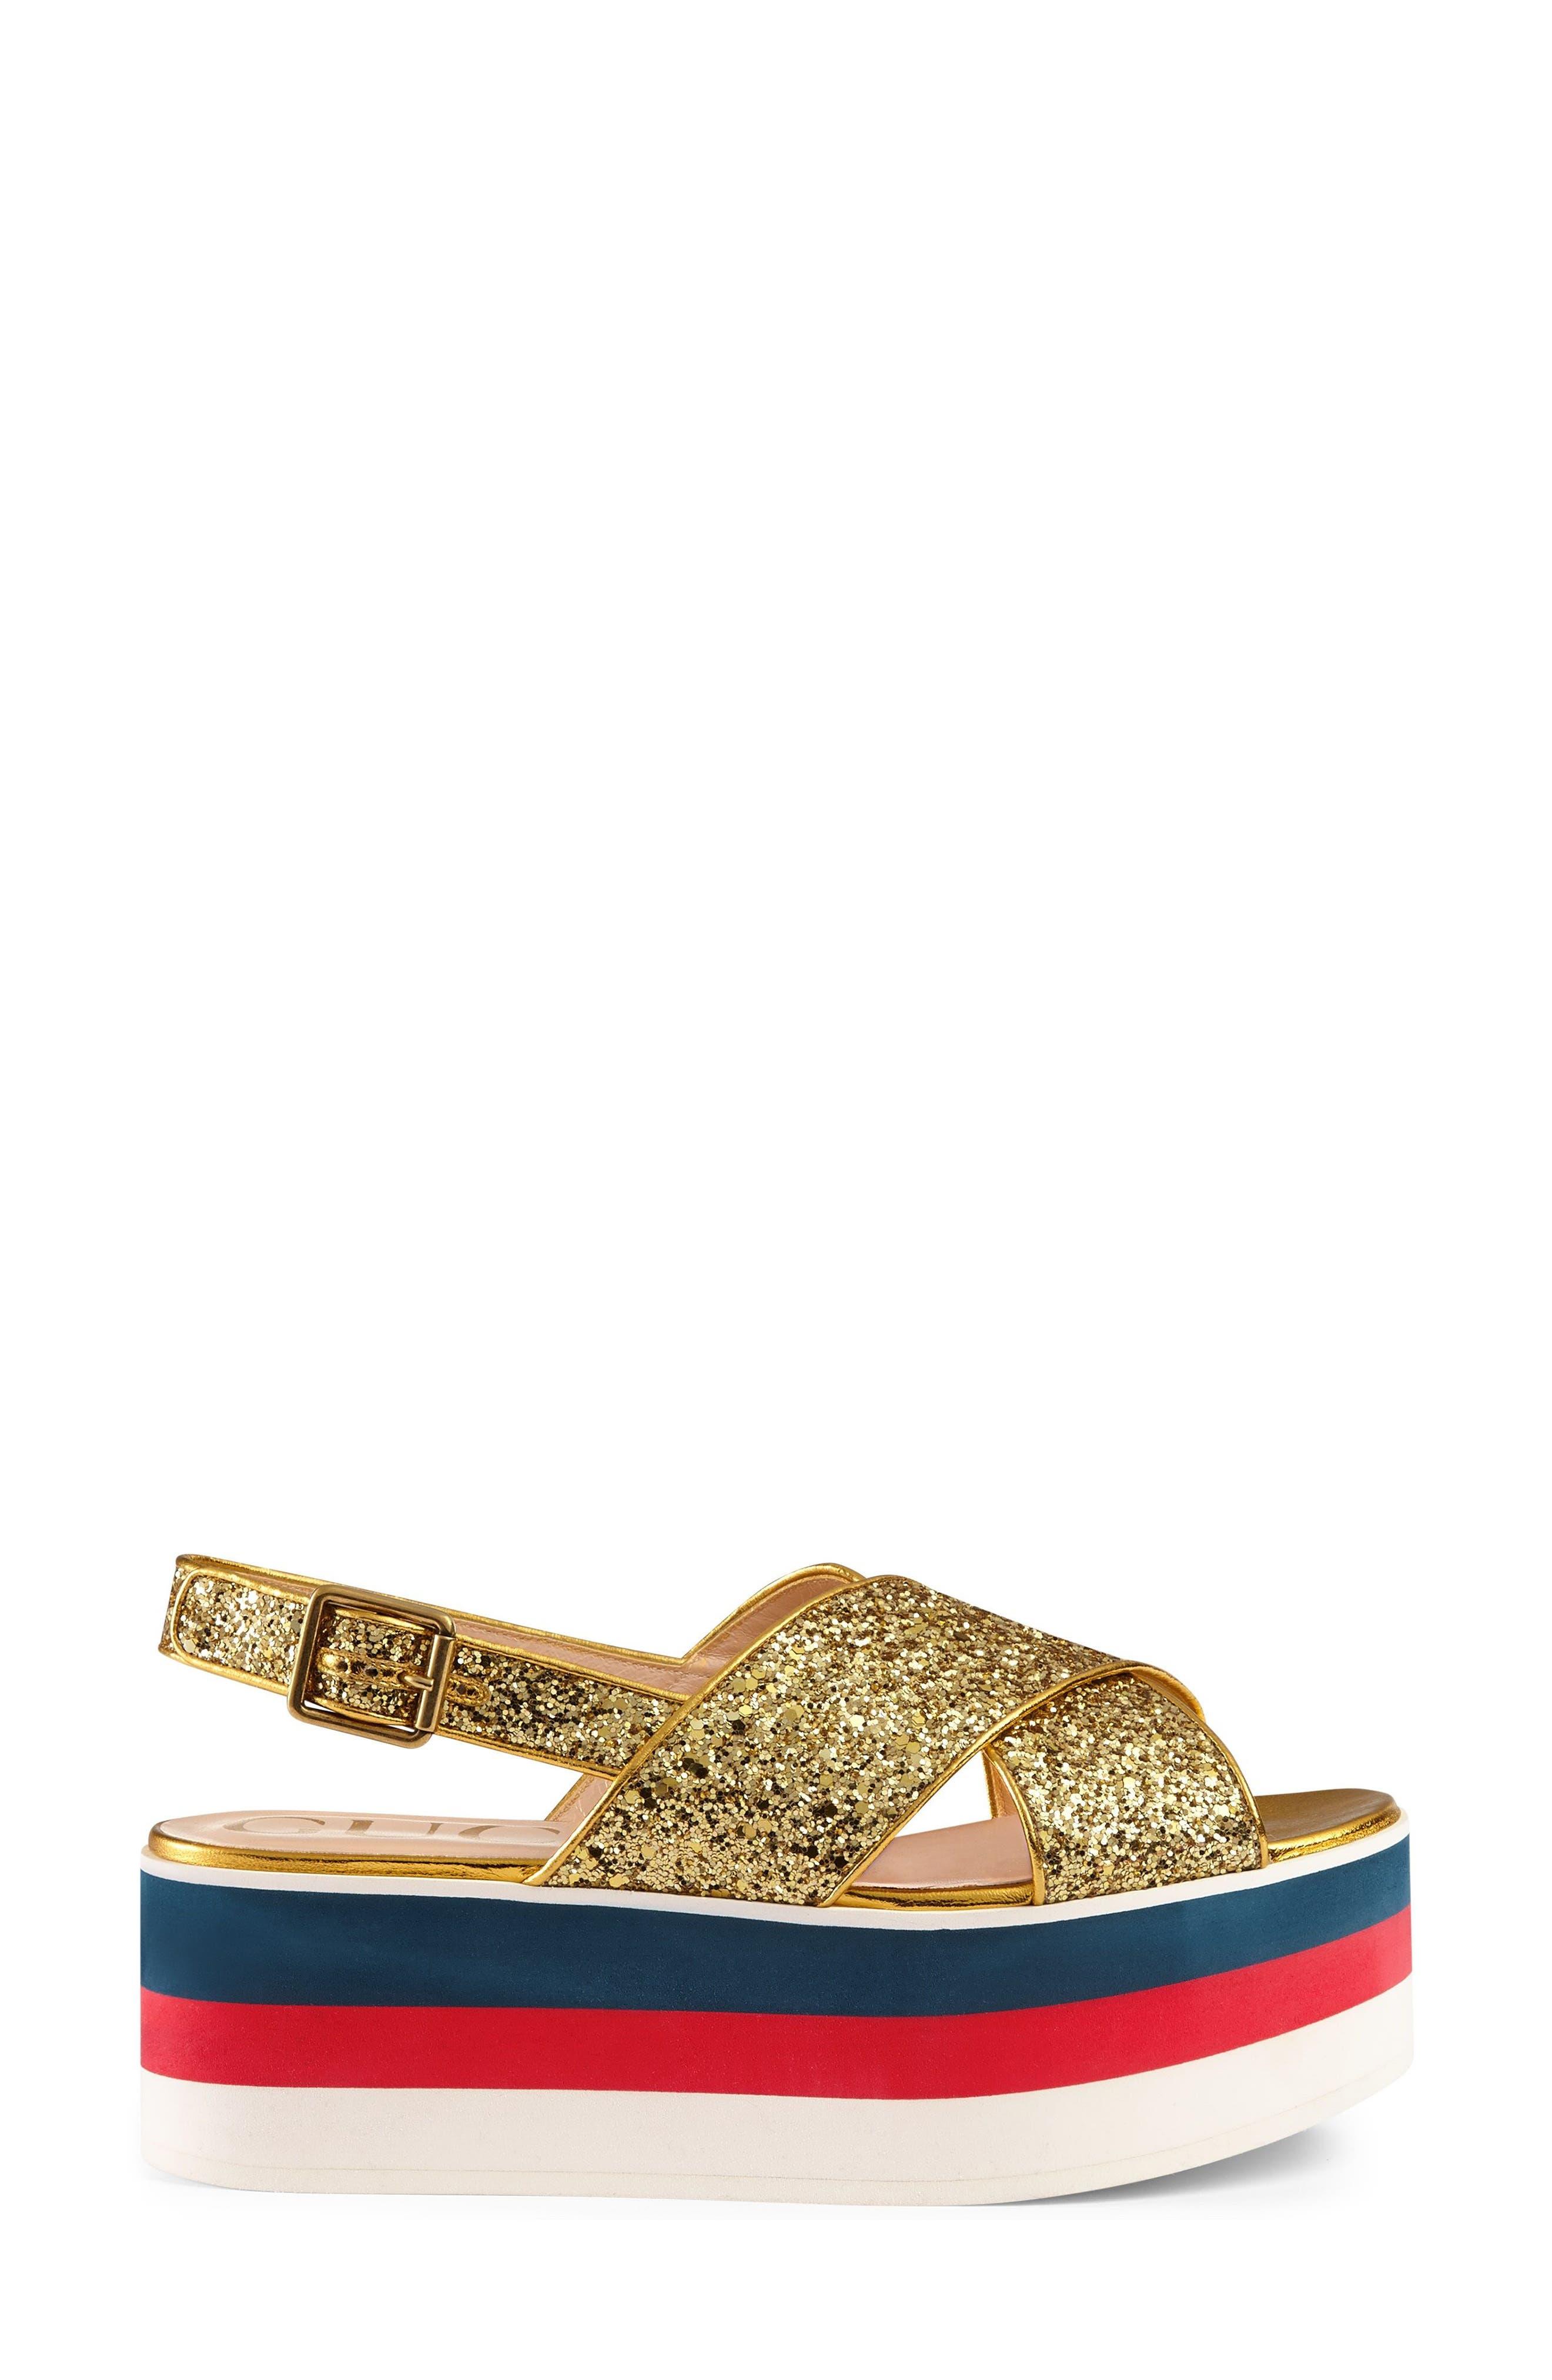 Main Image - Gucci Glitter Flatform Sandal (Women)